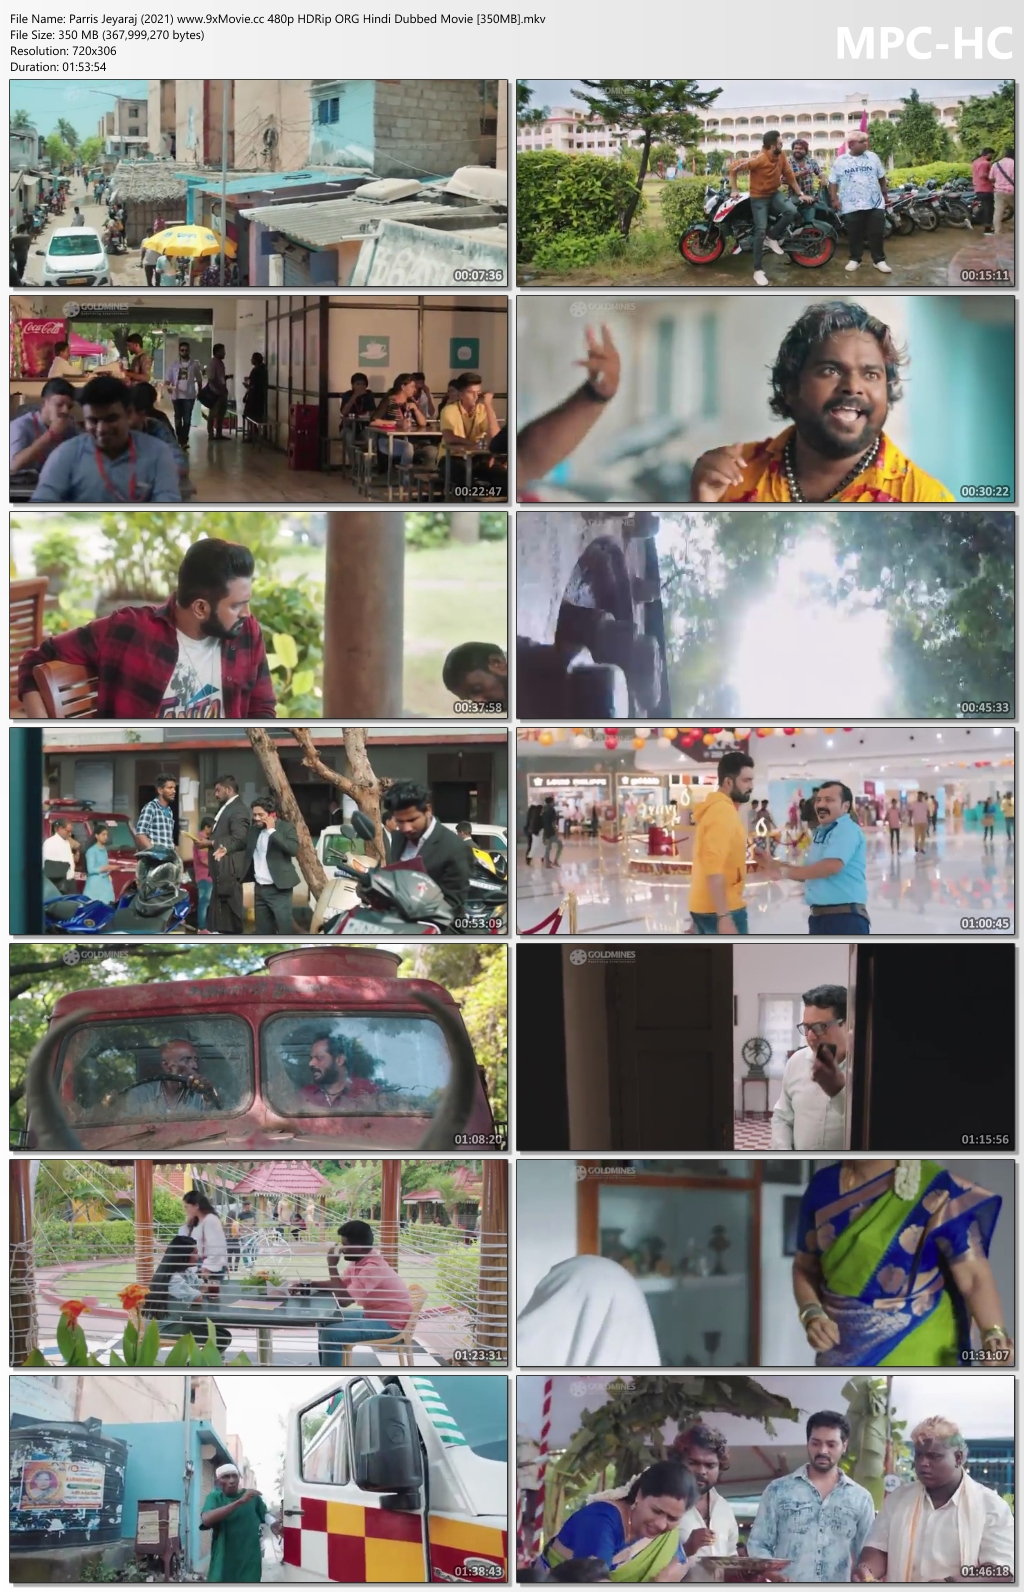 Parris-Jeyaraj-2021-www-9x-Movie-cc-480p-HDRip-ORG-Hindi-Dubbed-Movie-350-MB-mkv